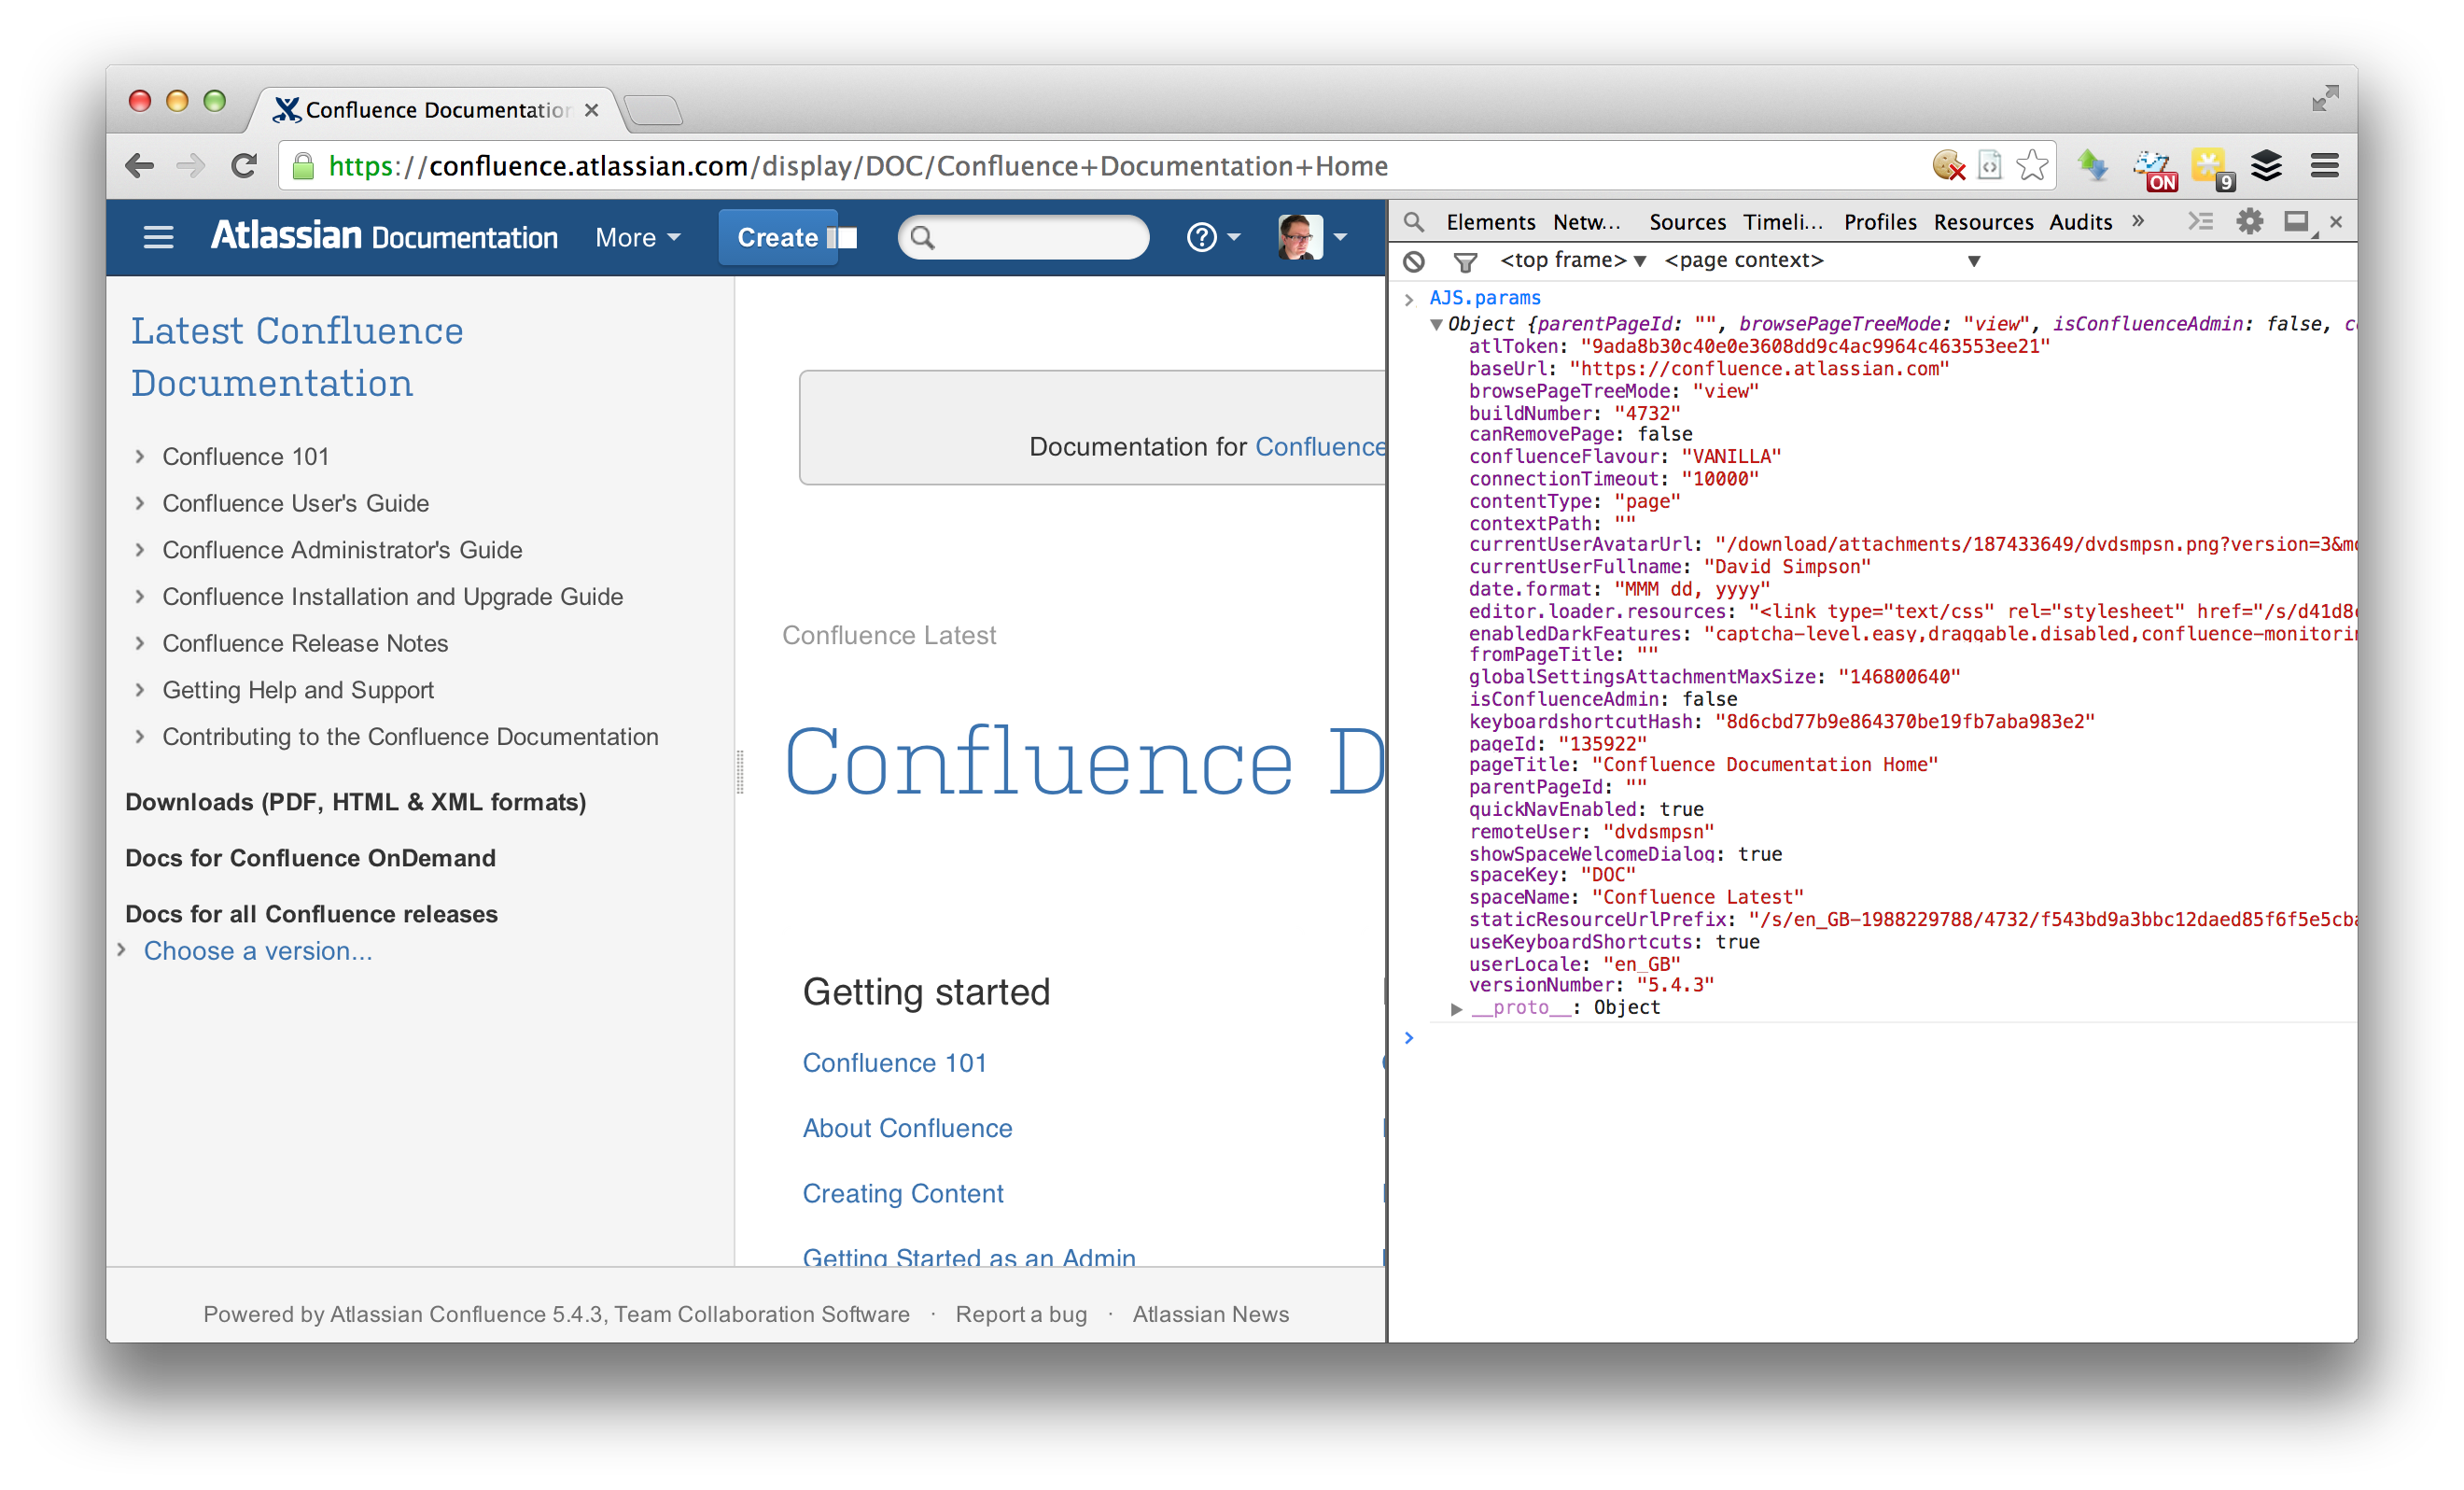 Extending AJS params in Atlassian Confluence – David Simpson